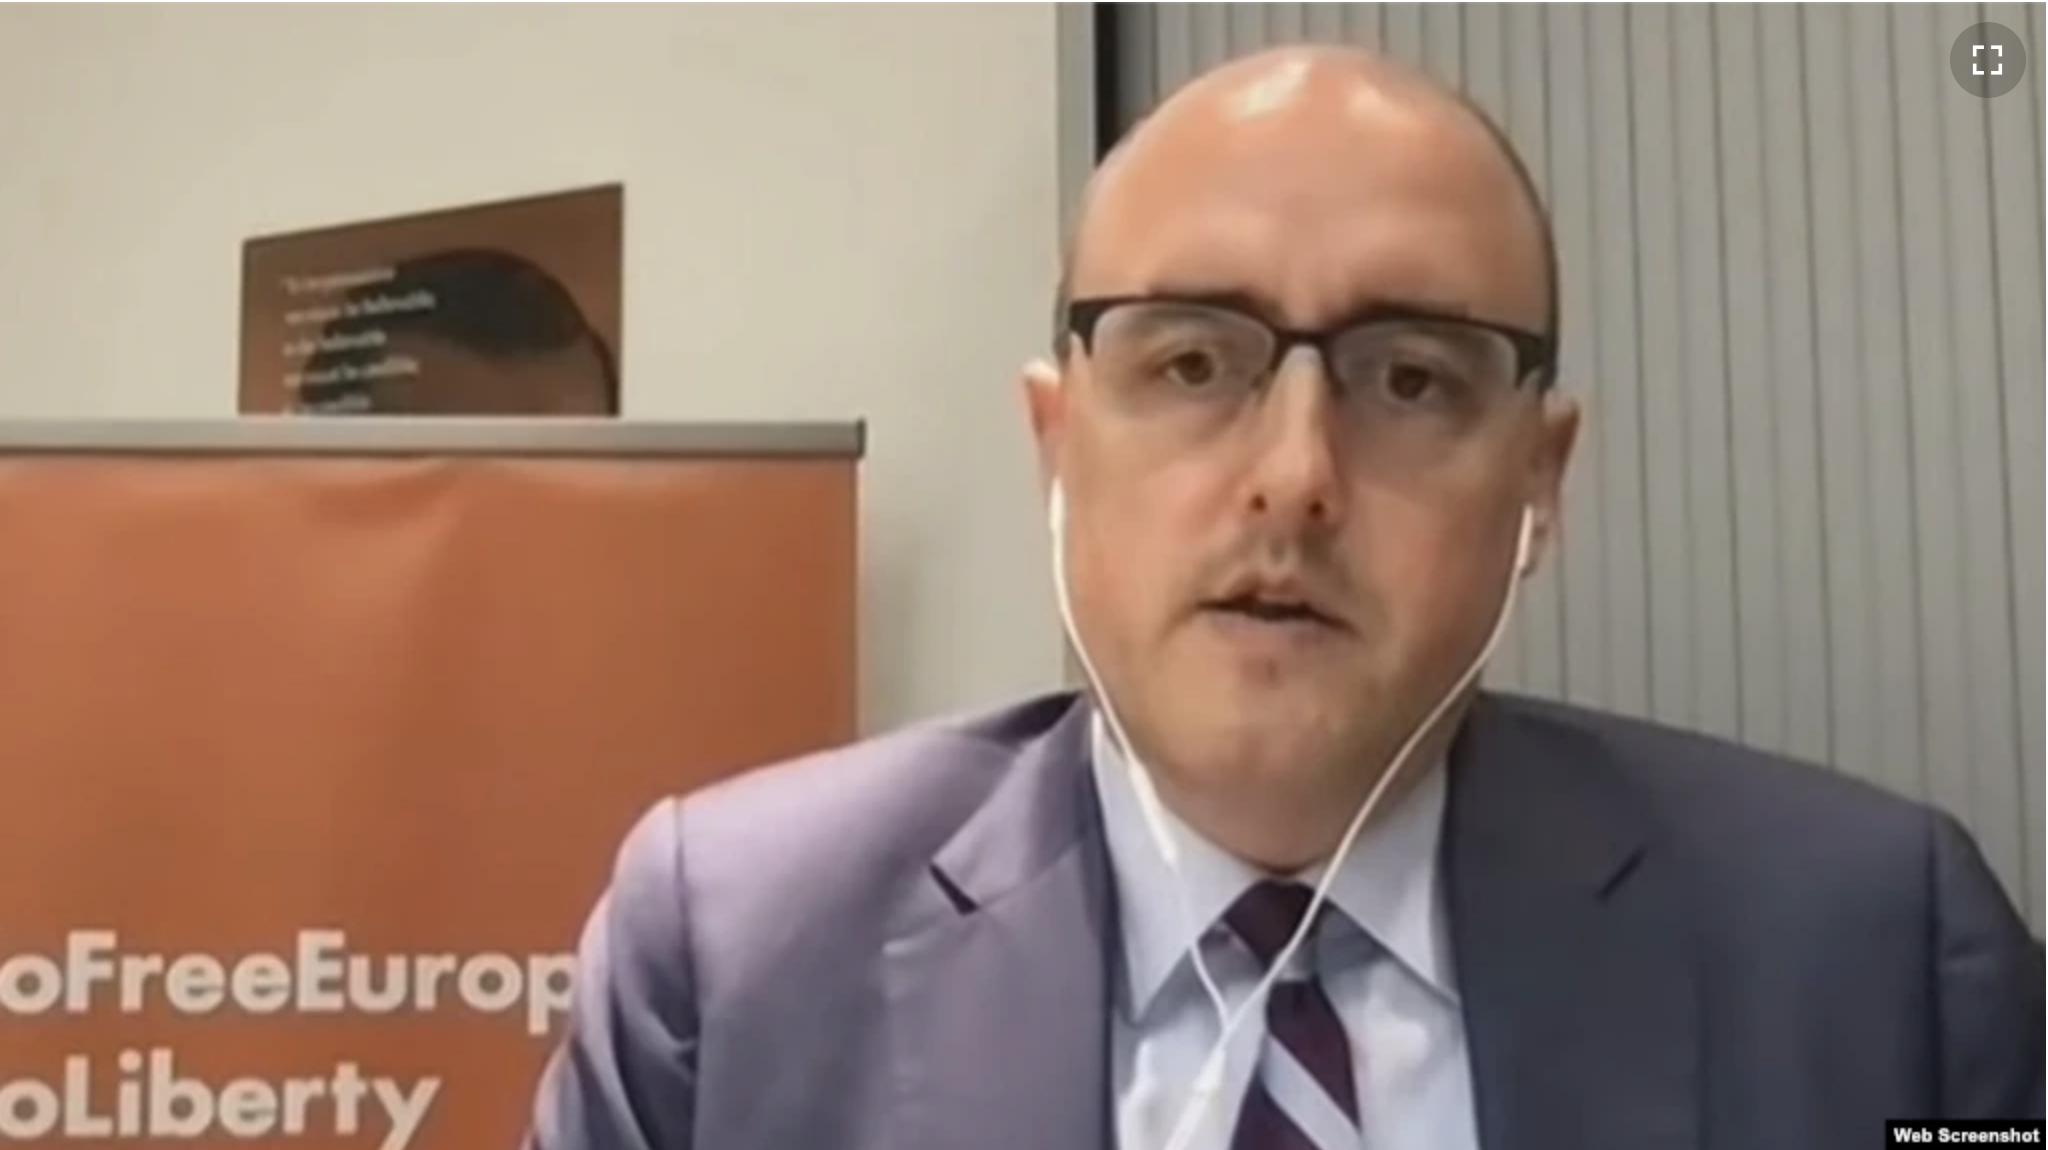 man with glasses wearing headphones